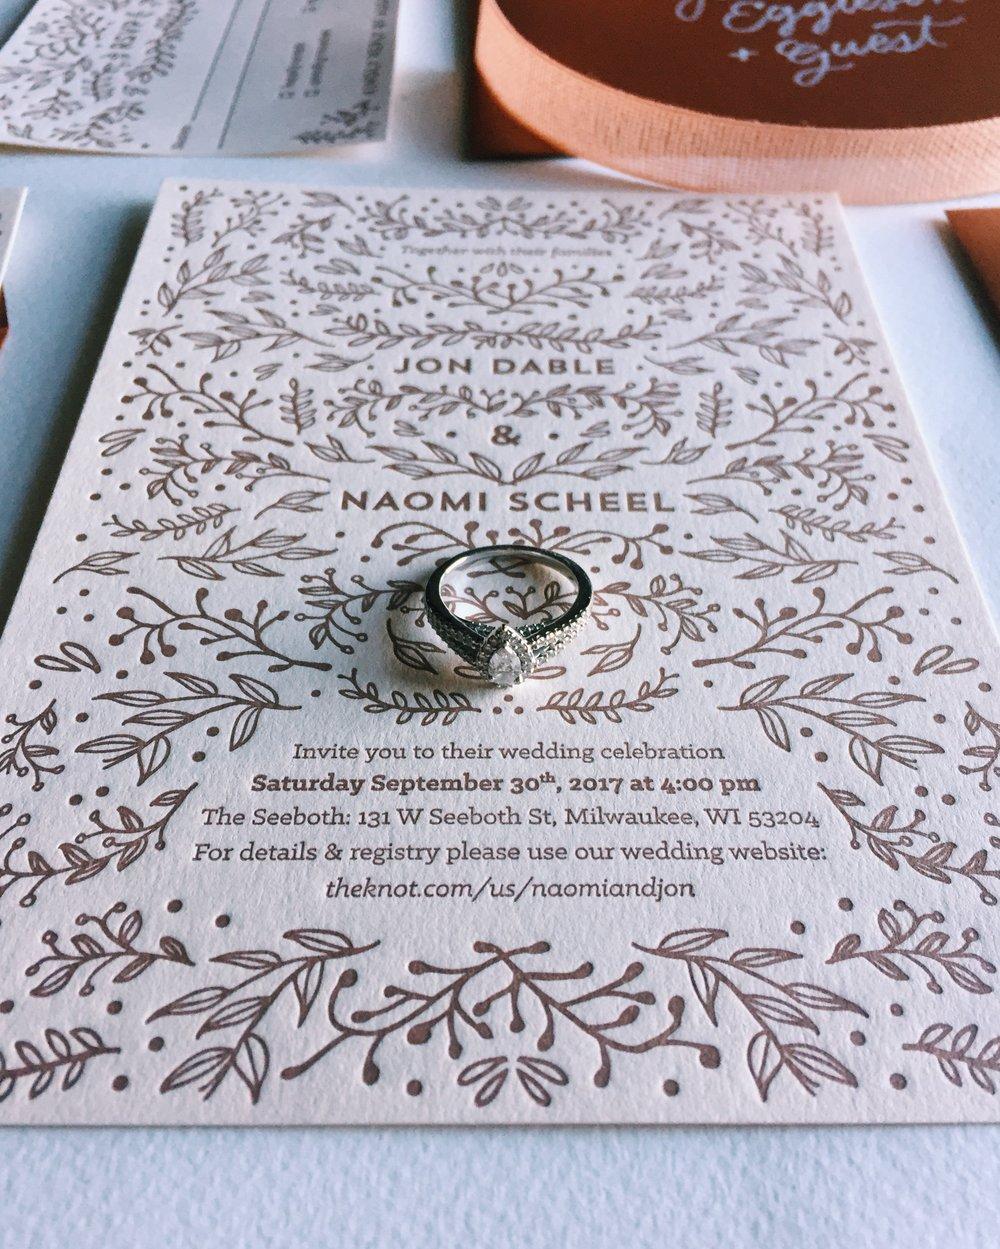 naomipaperco-wedding-invitation10.JPG